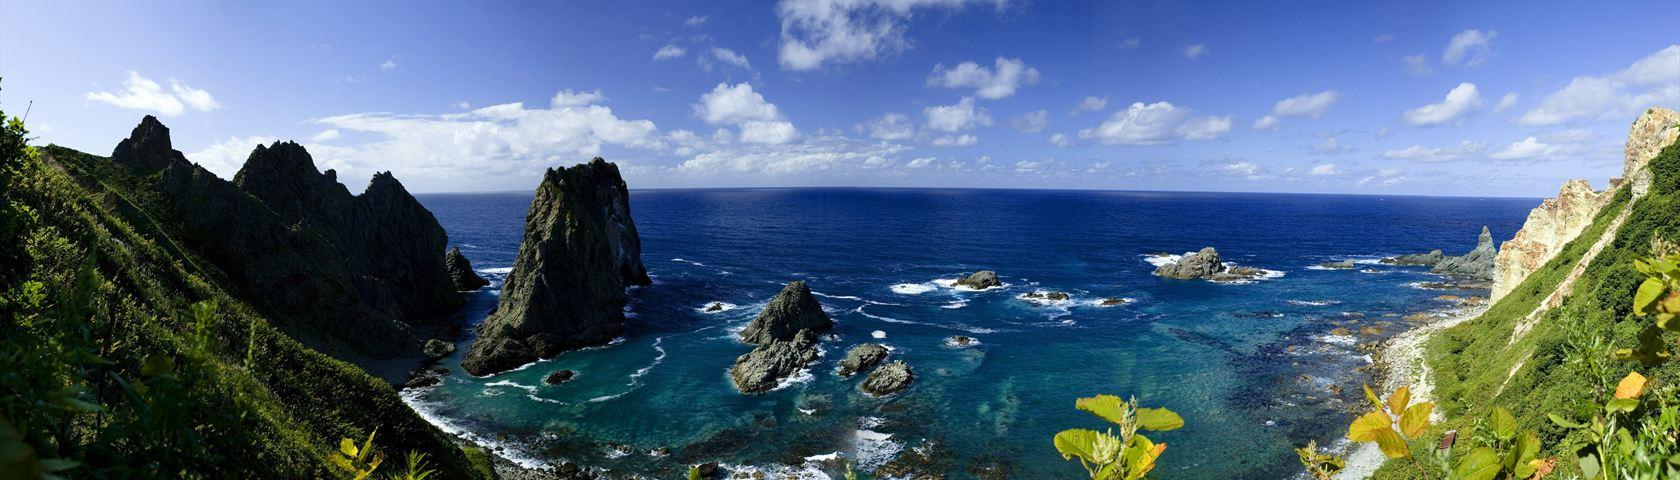 Japanese Shoreline